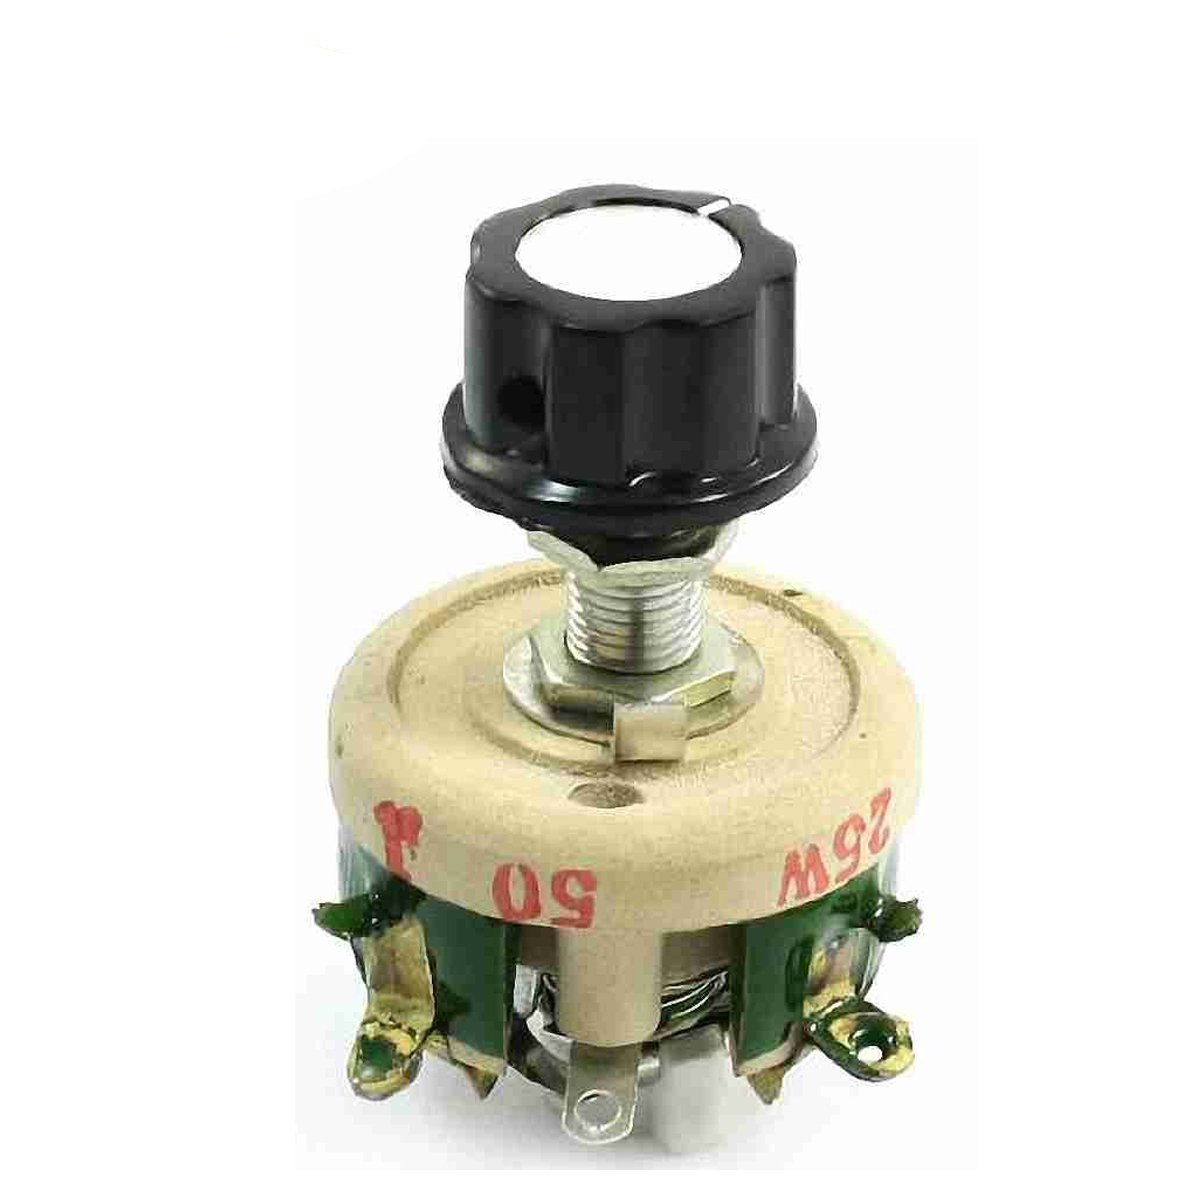 YXQ 25W 50 Ohm Resistor Rheostat Porcelain Plate Sliding Resistors